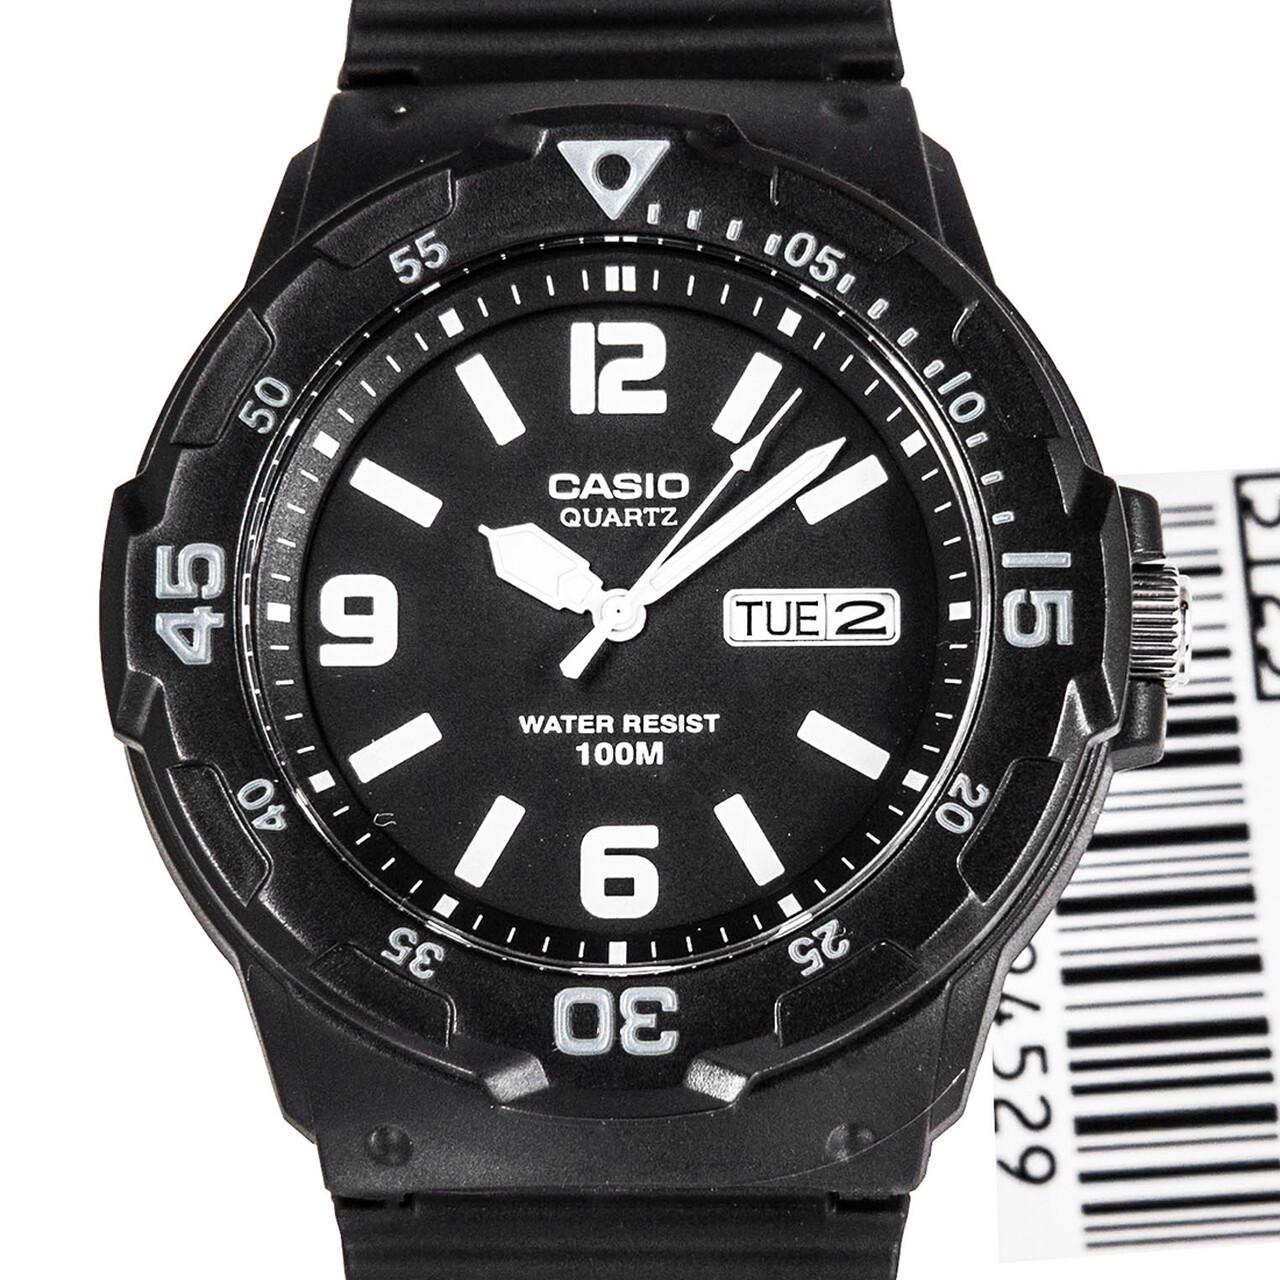 Reloj Casio hombre deportivo MRW-200H-1B2